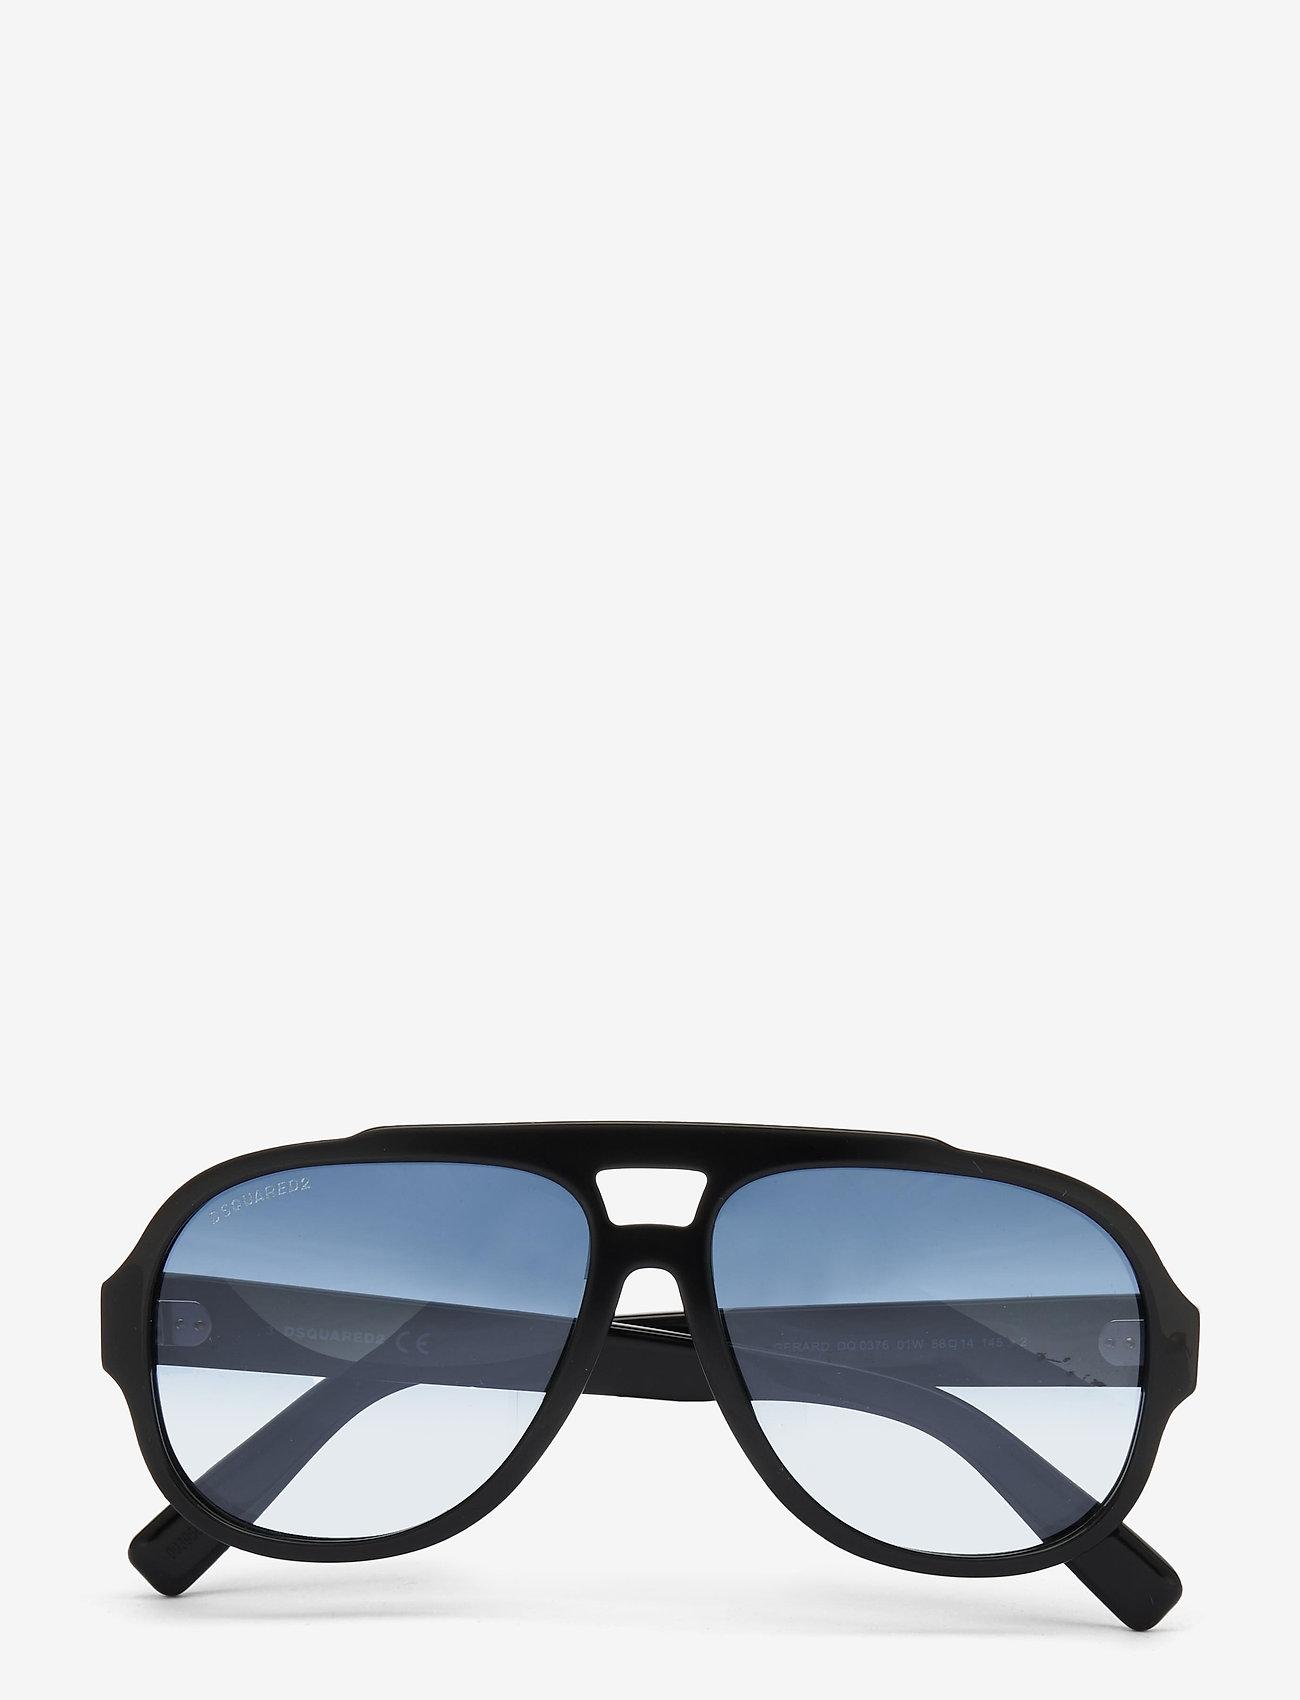 DSQUARED2 Sunglasses - Gerard - shiny black  / gradient blue - 0